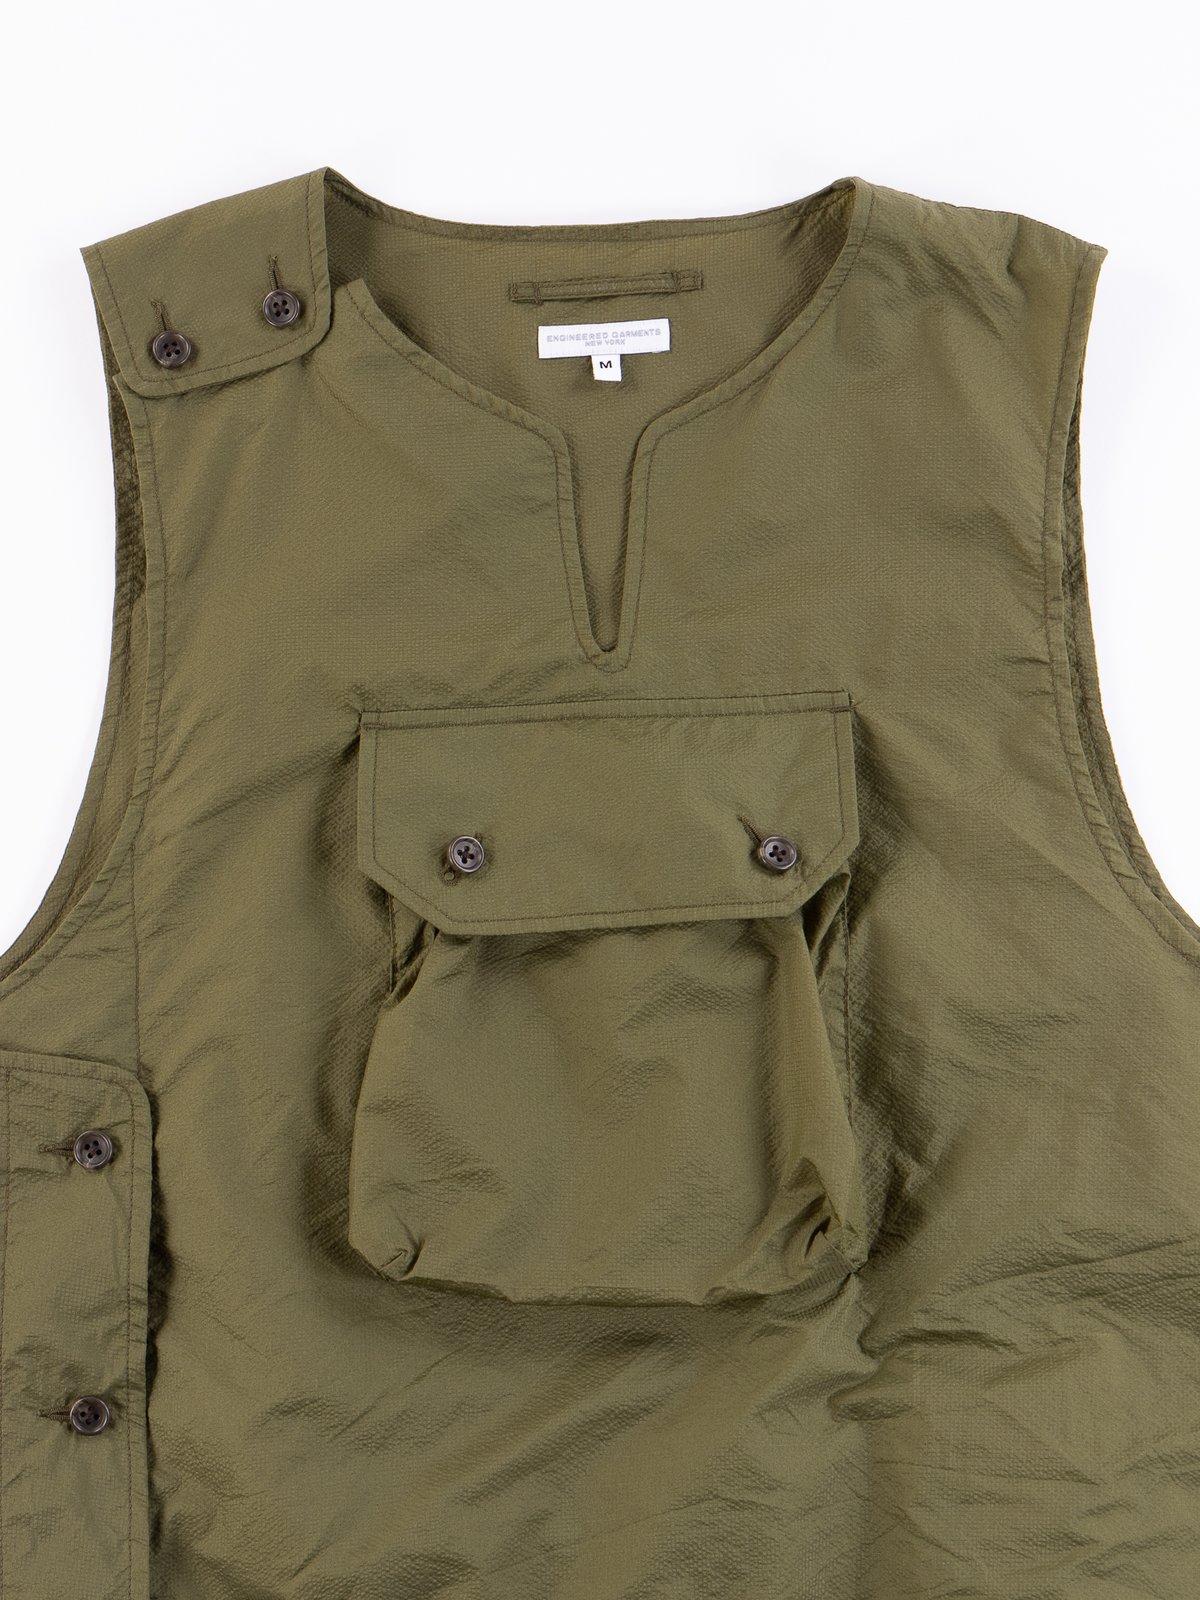 Olive Nylon Micro Ripstop Cover Vest - Image 3